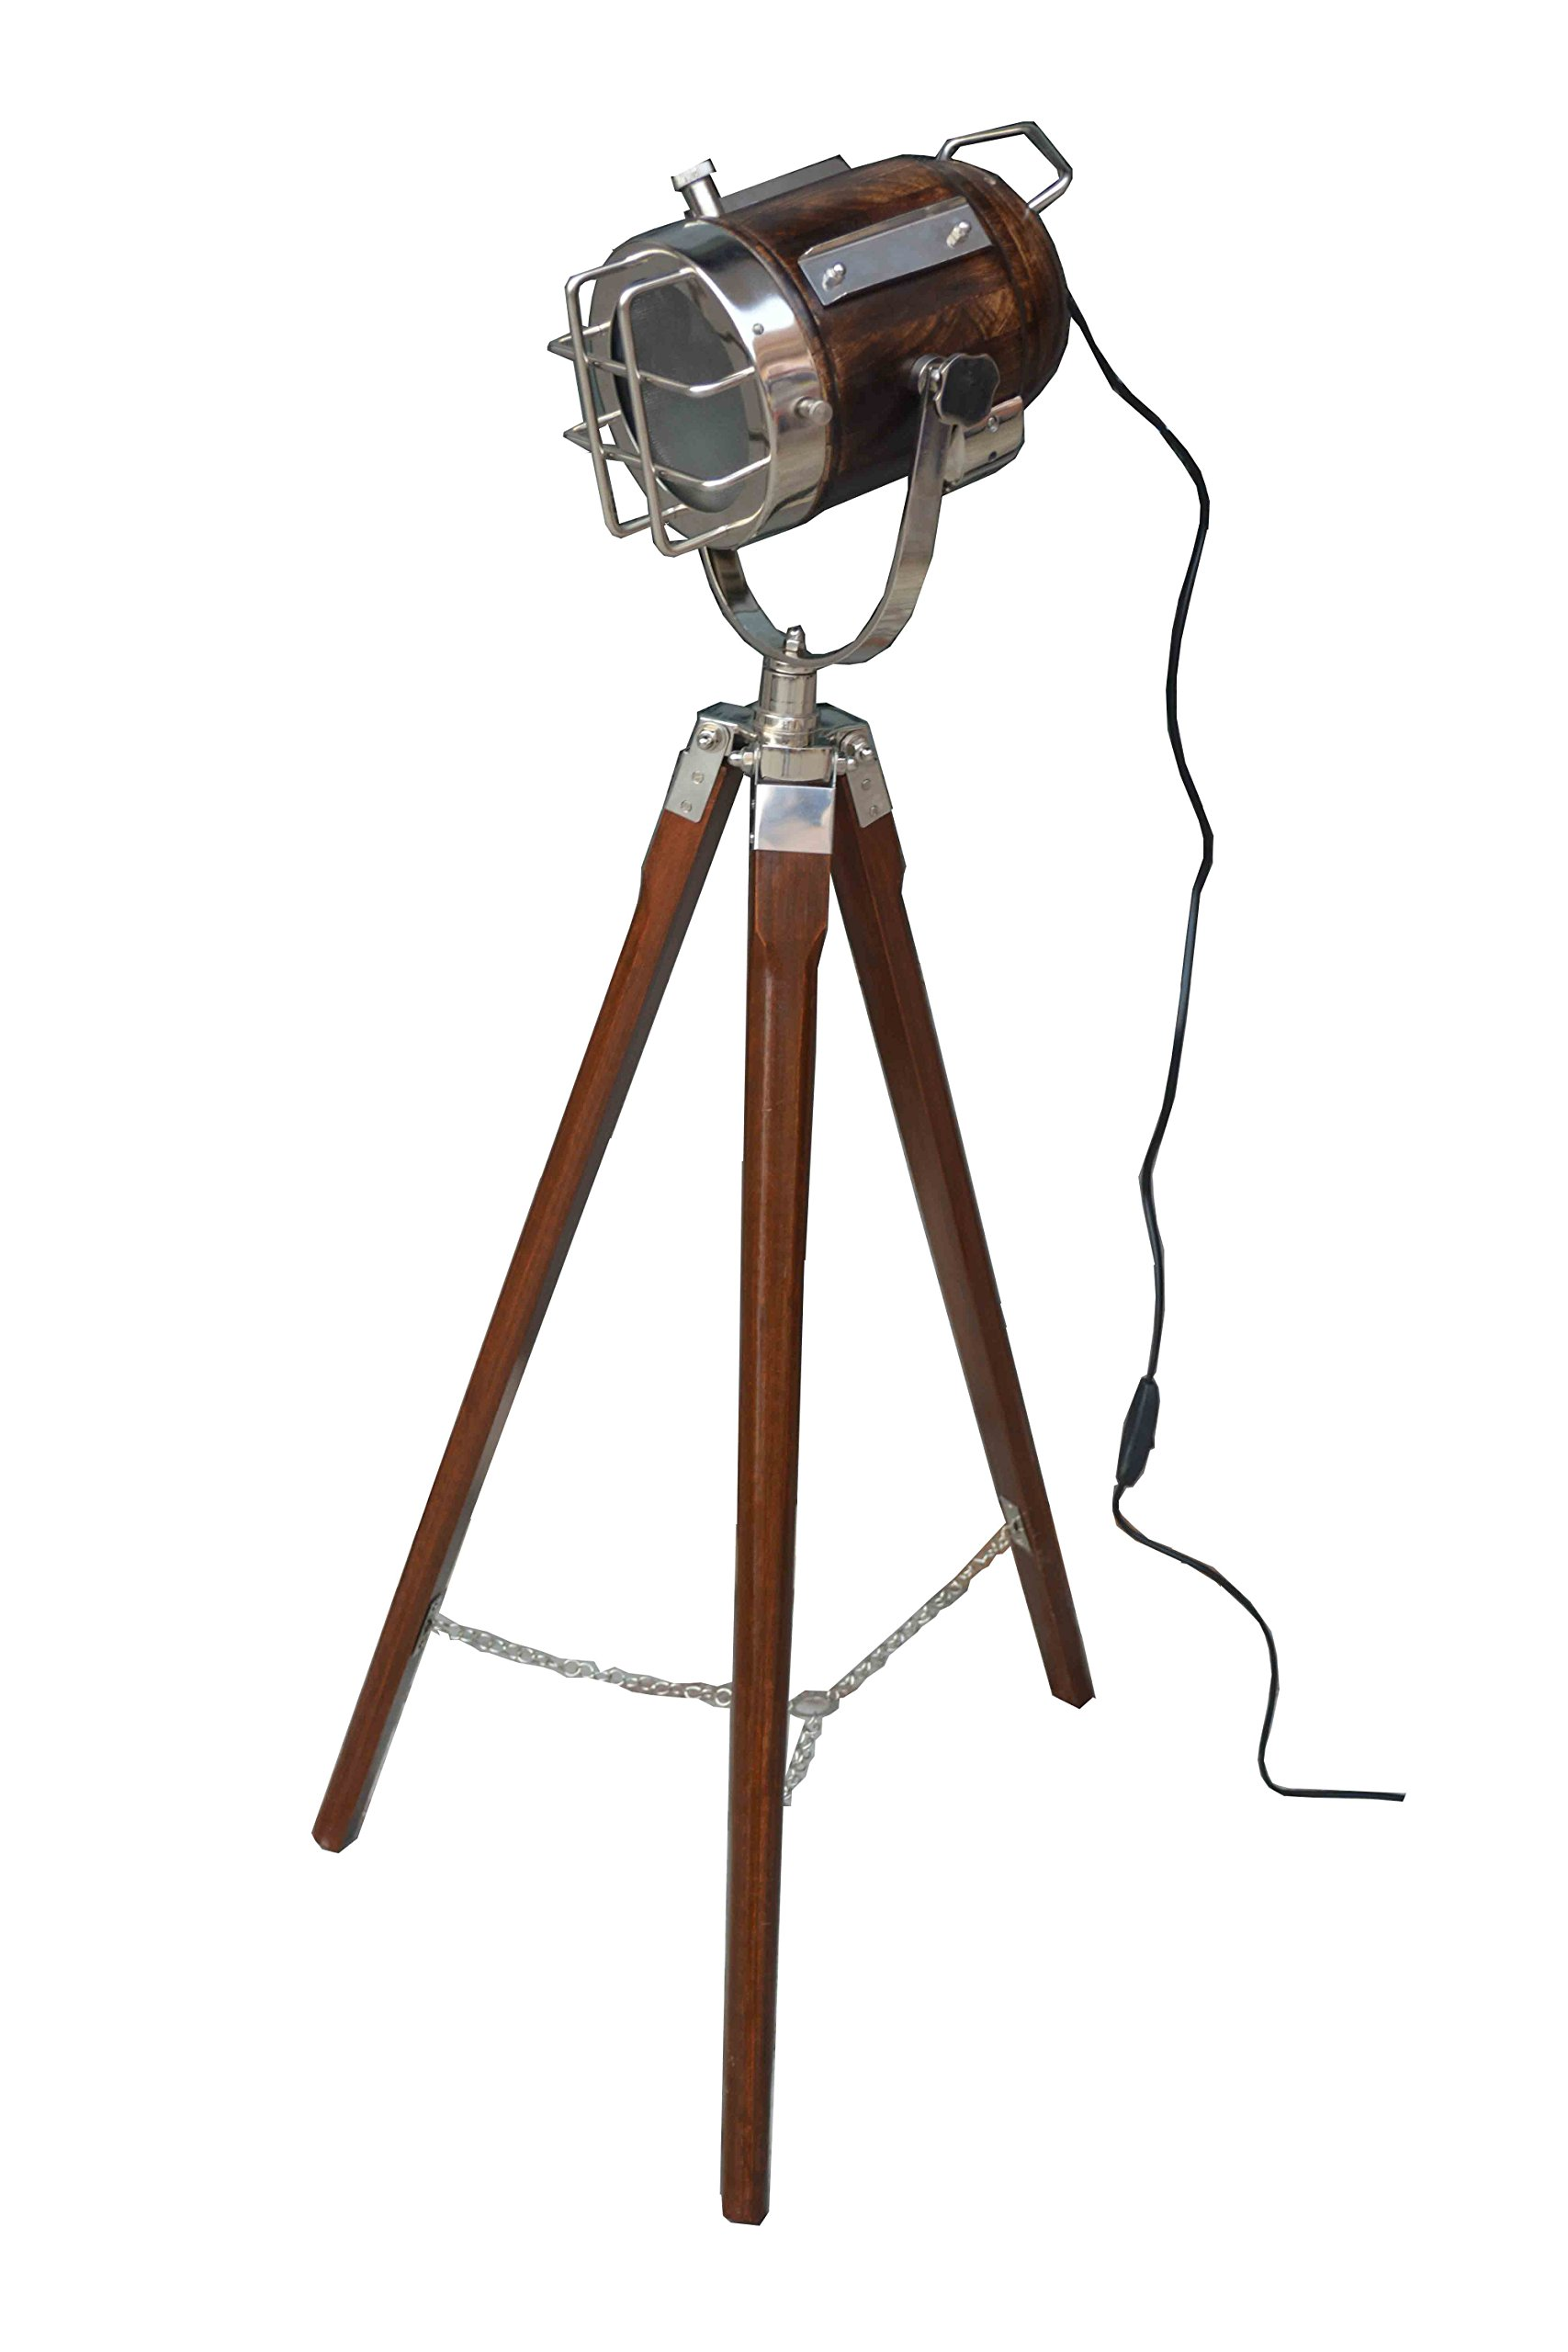 DESIGNER STUDIO FLOOR LAMP TRIPOD SEARCHLIGHT HOME DECOR LIGHT by Nautical India (Image #1)